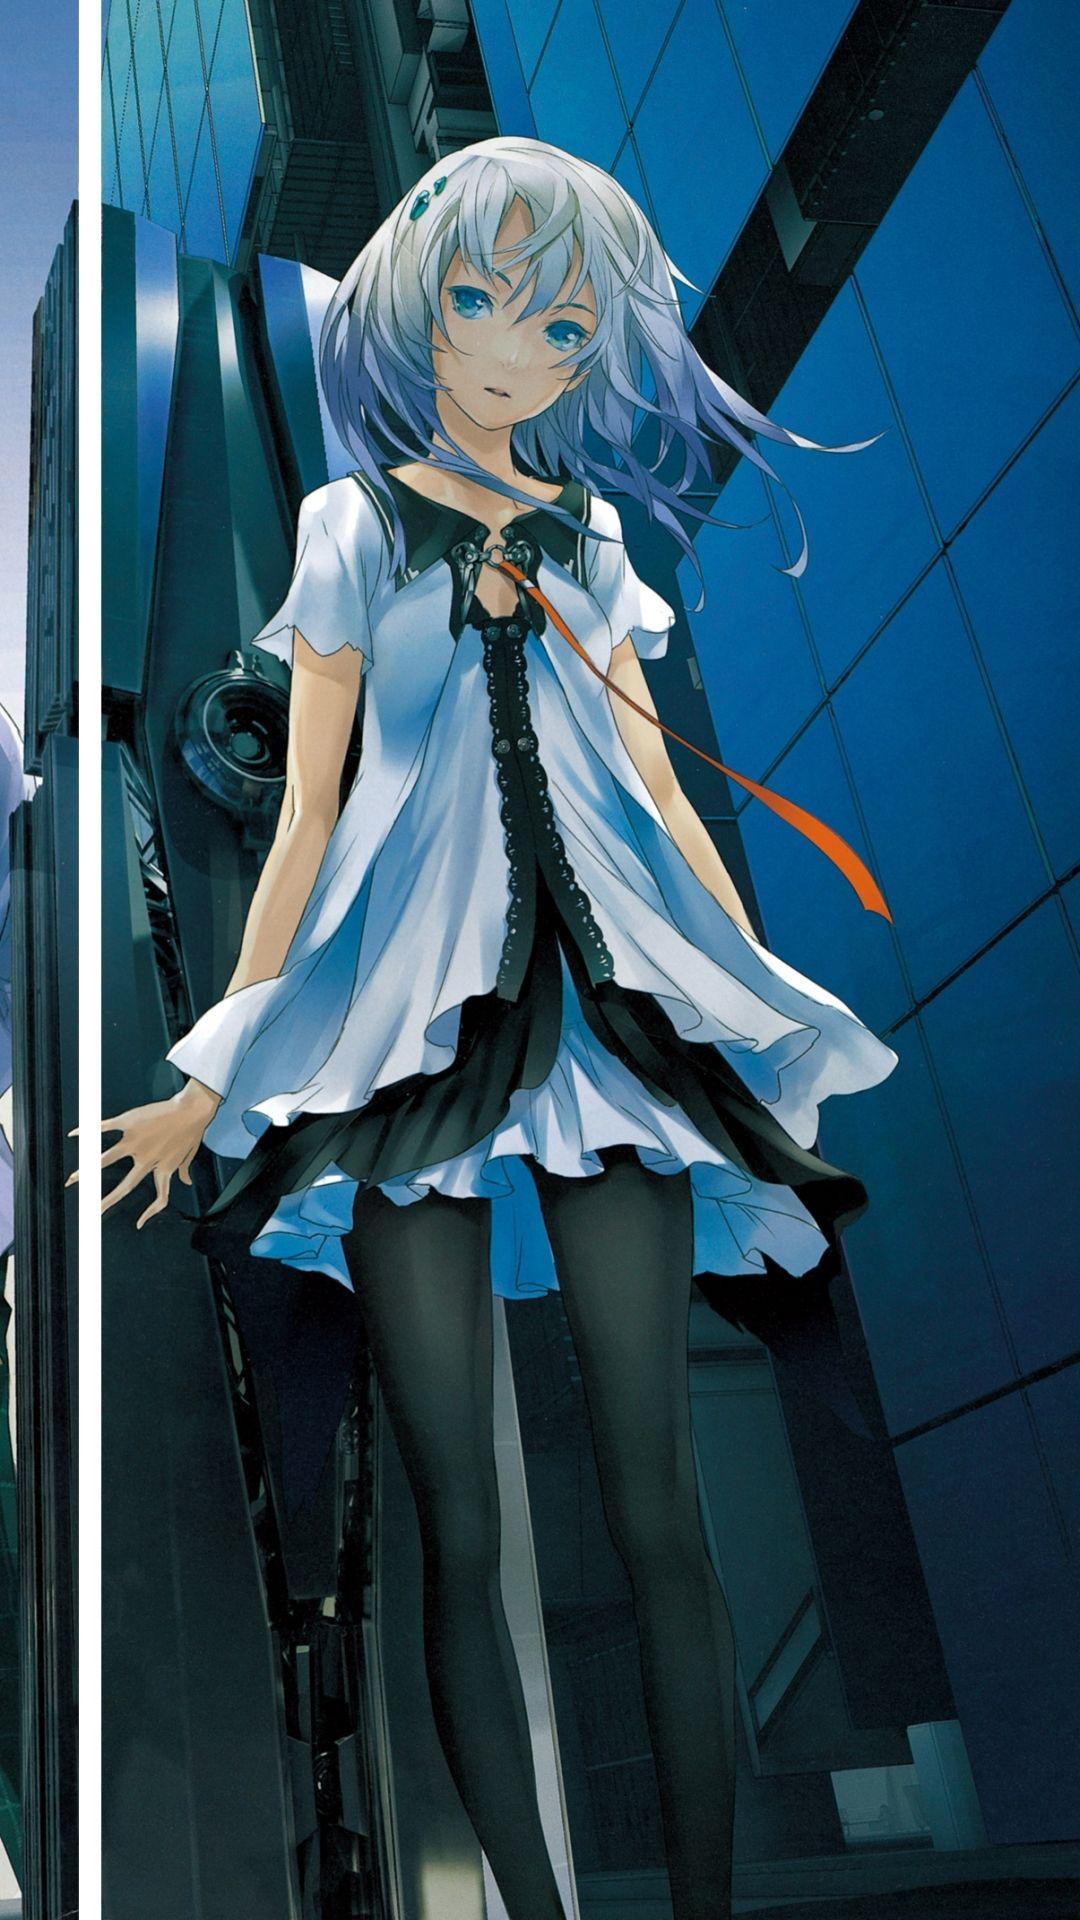 Anime Beatless Lacia (Beatless) (1080x1920) Mobile